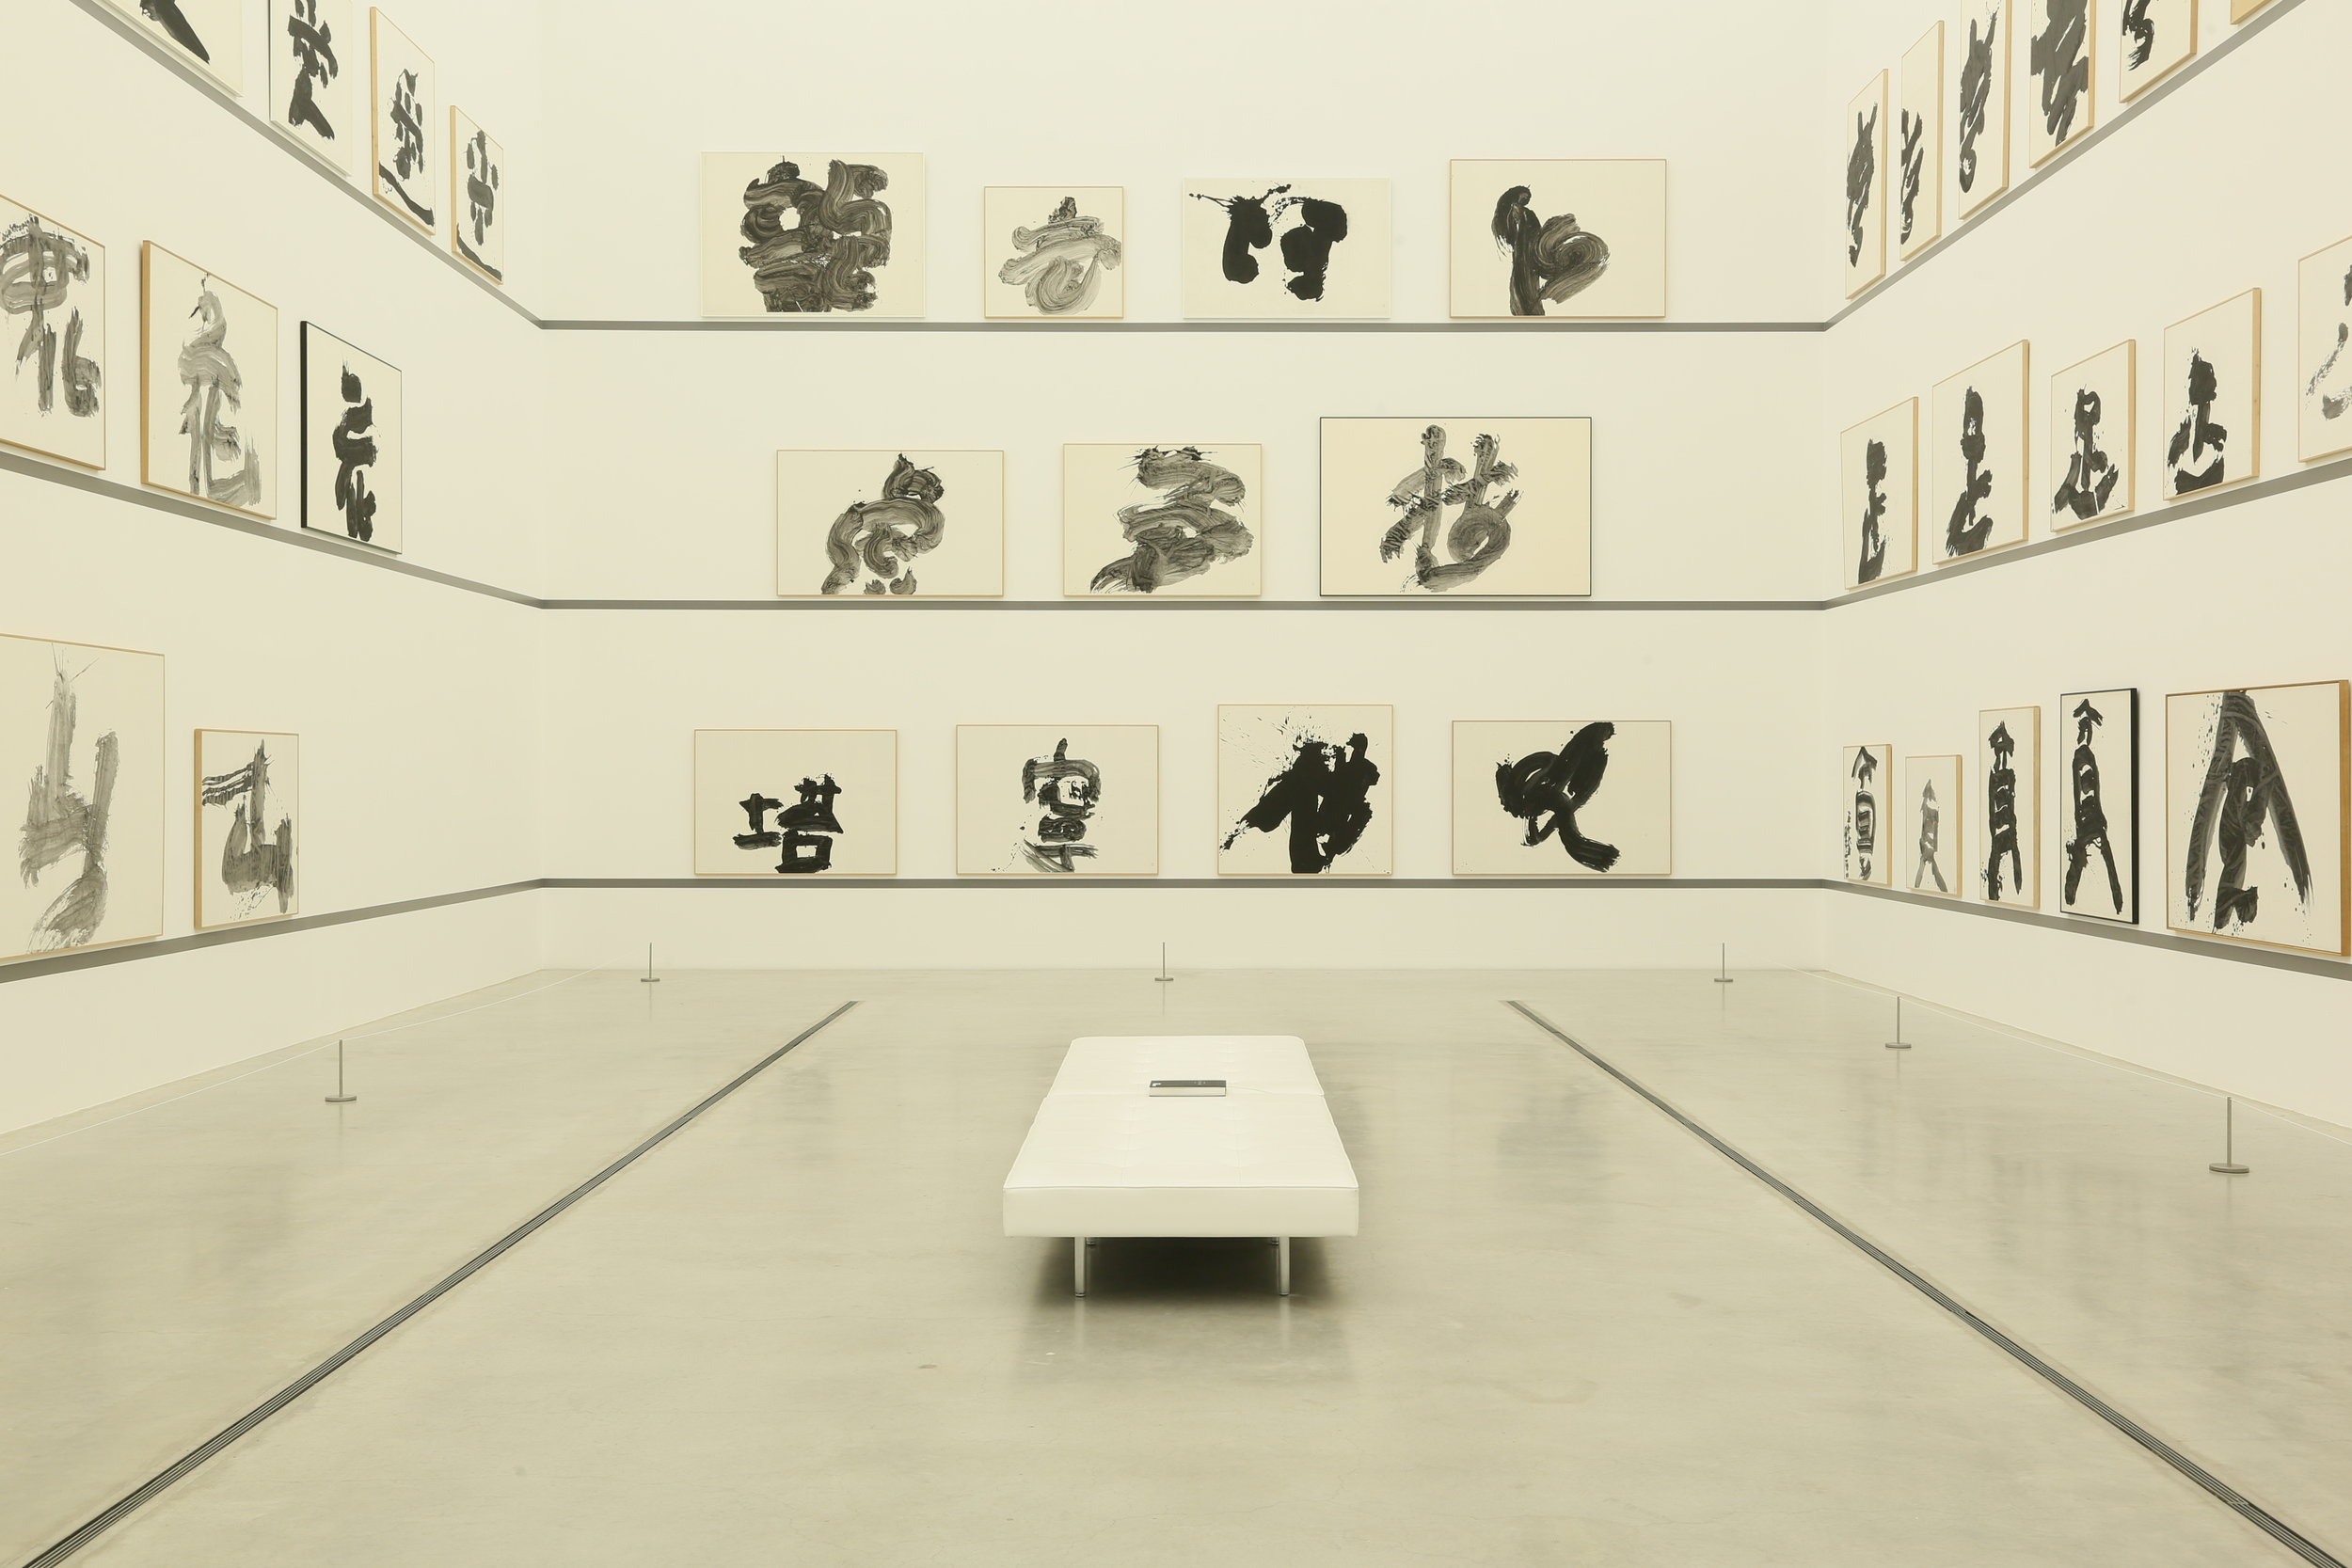 金沢21世紀美術館「生誕100年記念 井上有一」   Inoue Yuichi Retrospective,  21st Century Museum of Contemporary Art, Kanazawa ©︎Yuichi Ihara